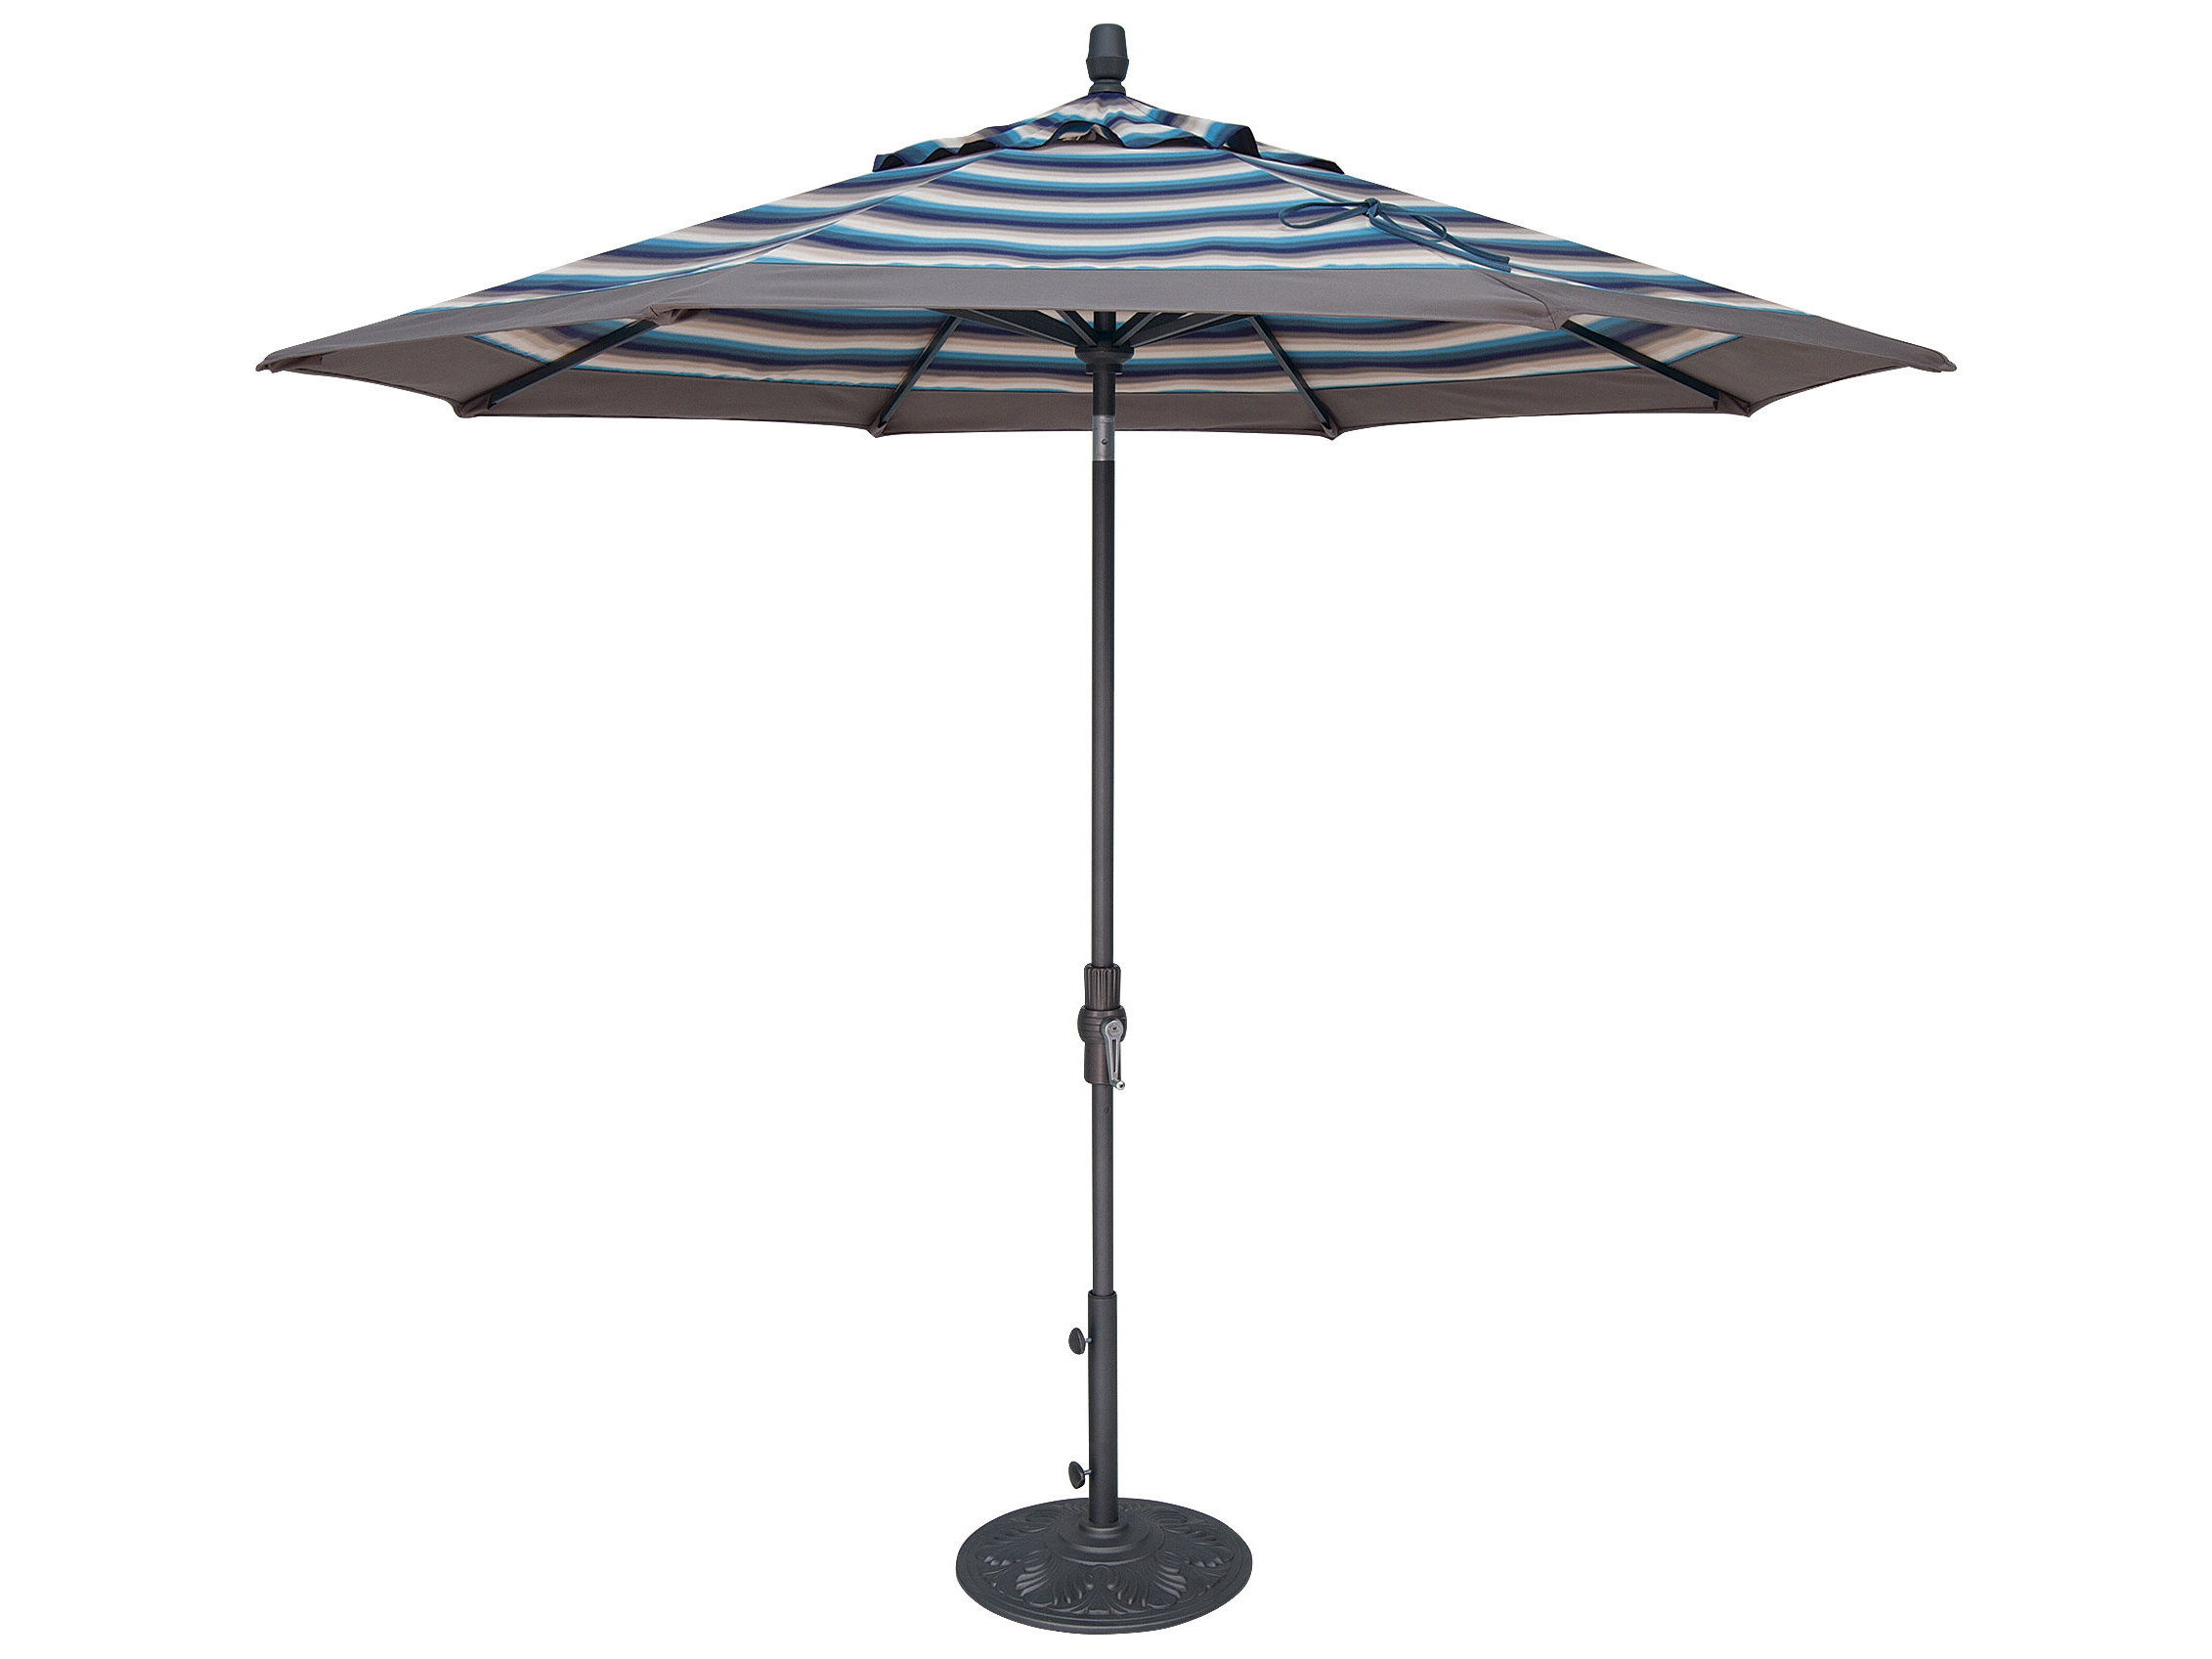 treasure garden market aluminum 9 octagon collar tilt crank lift umbrella - Treasure Garden Umbrella